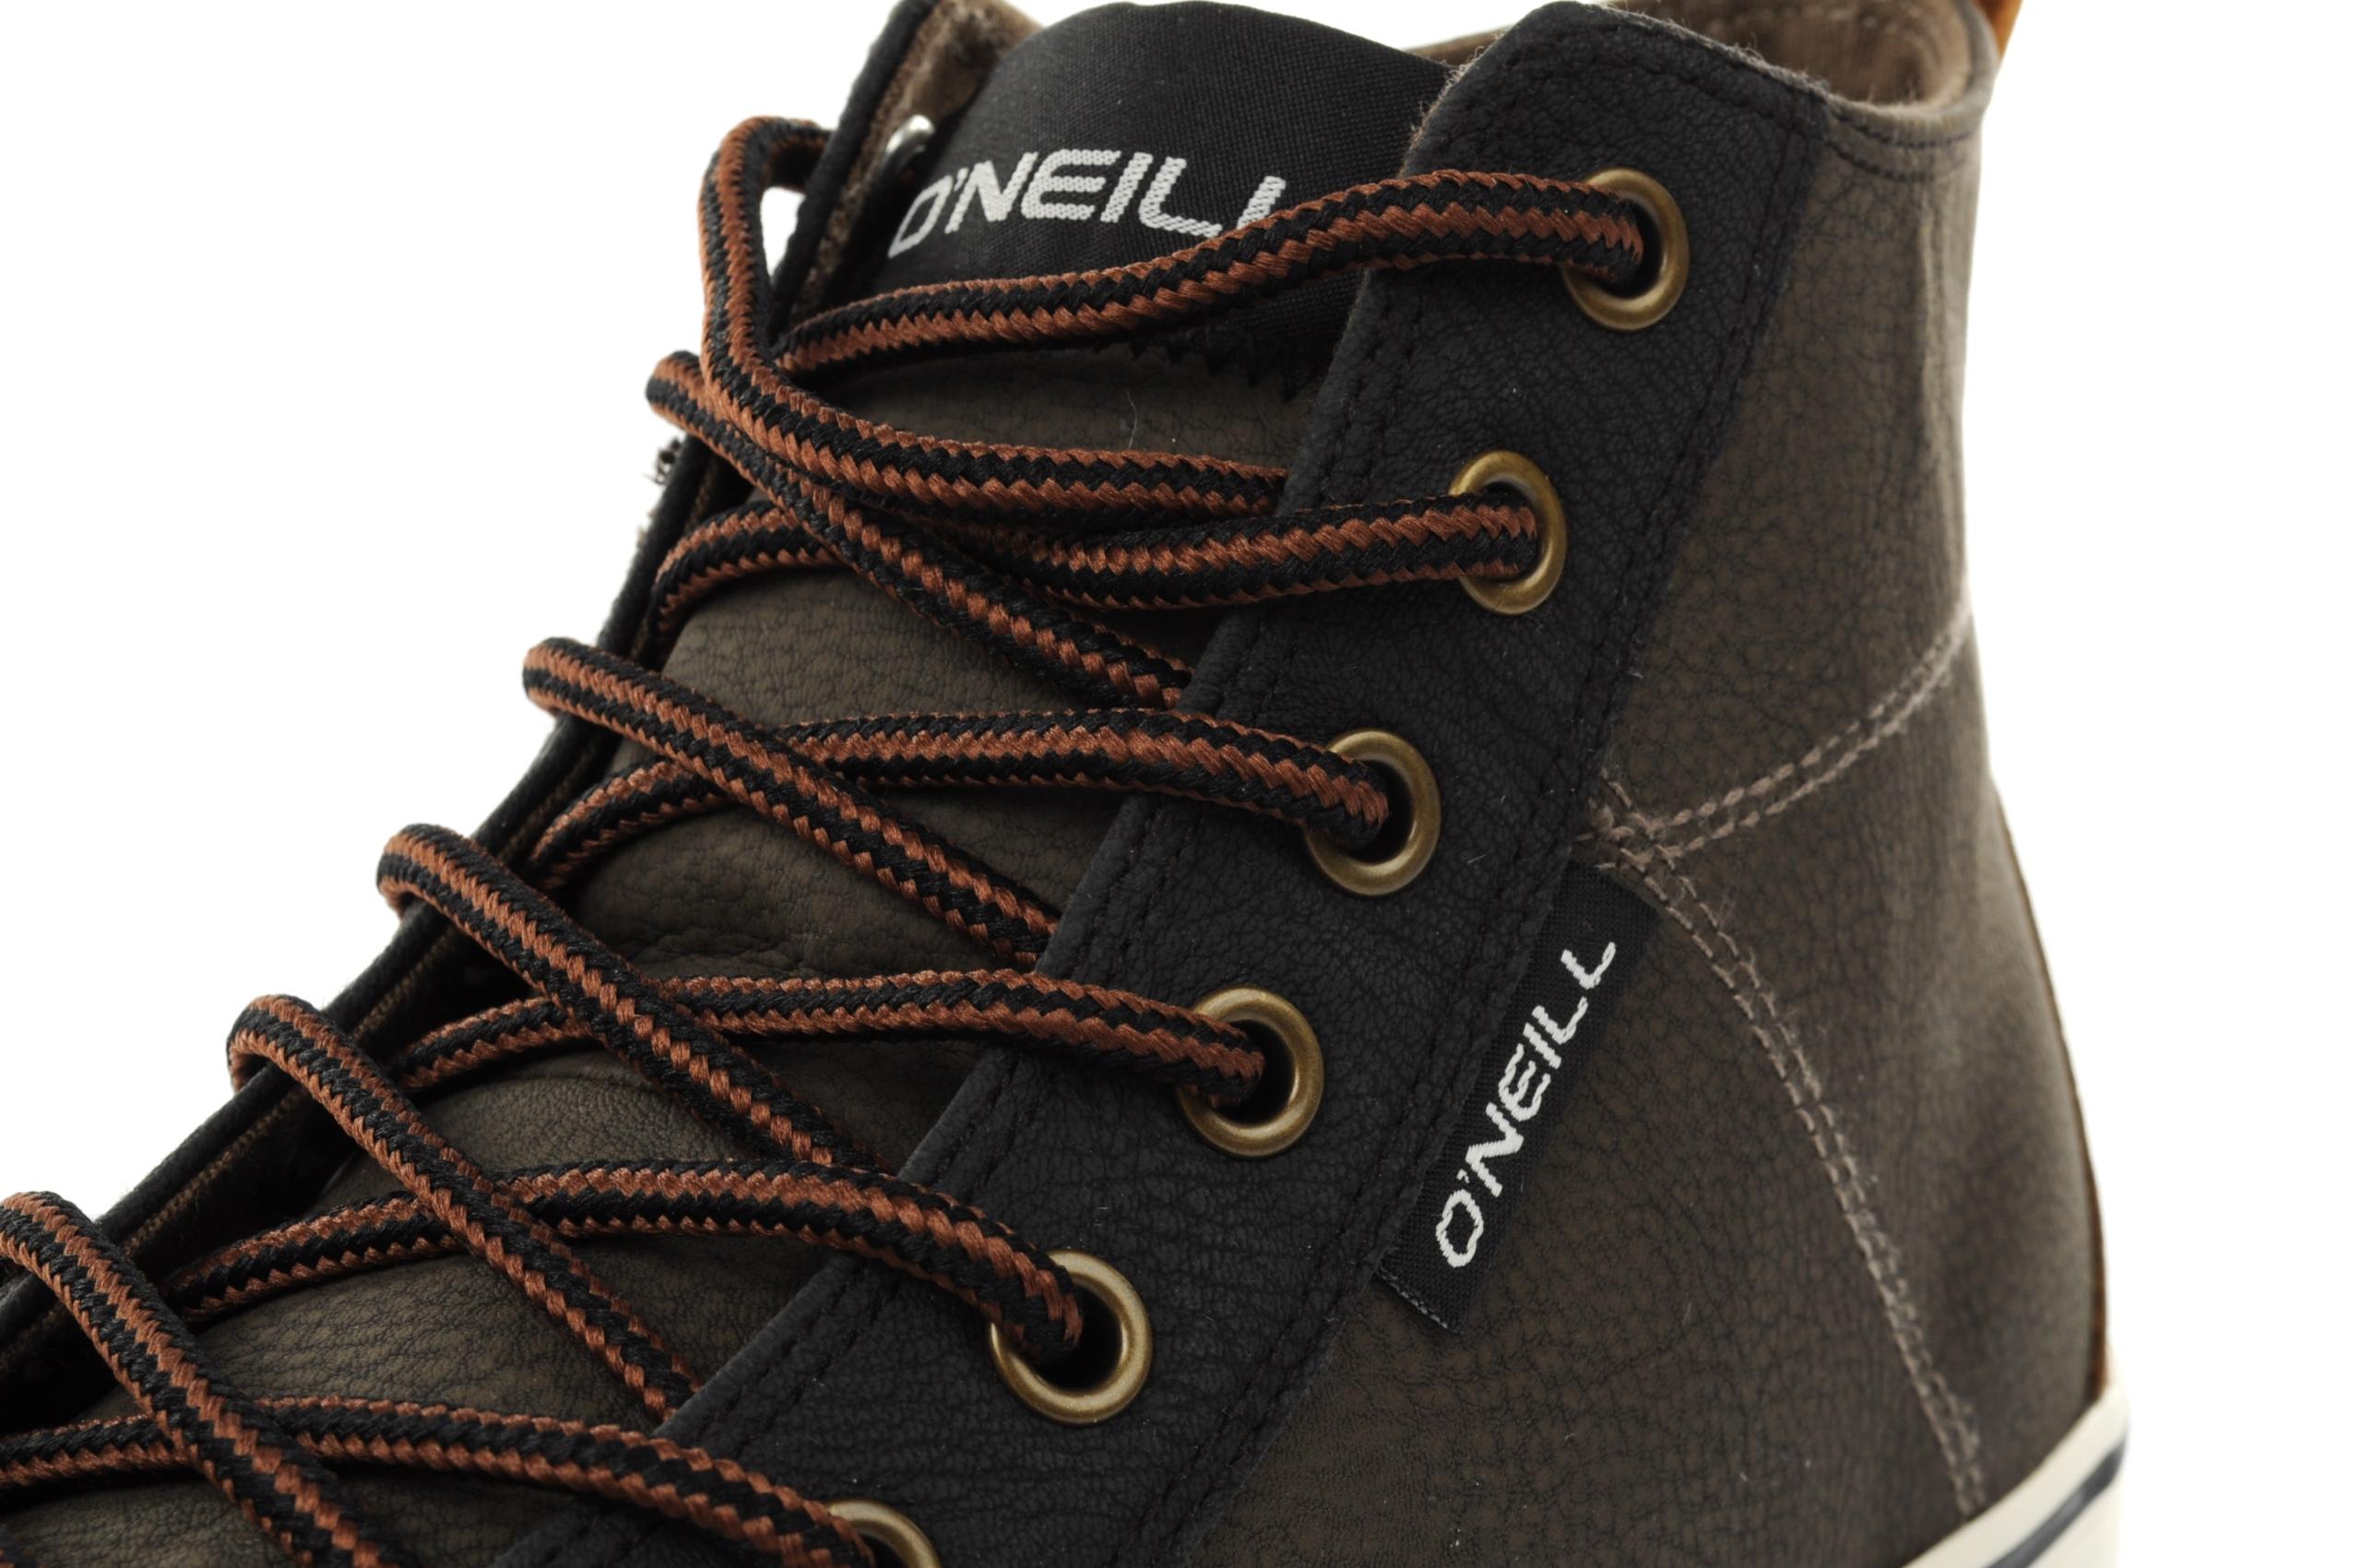 Buty sportowe ONEILL [E25] trampki O'NEILL r.41